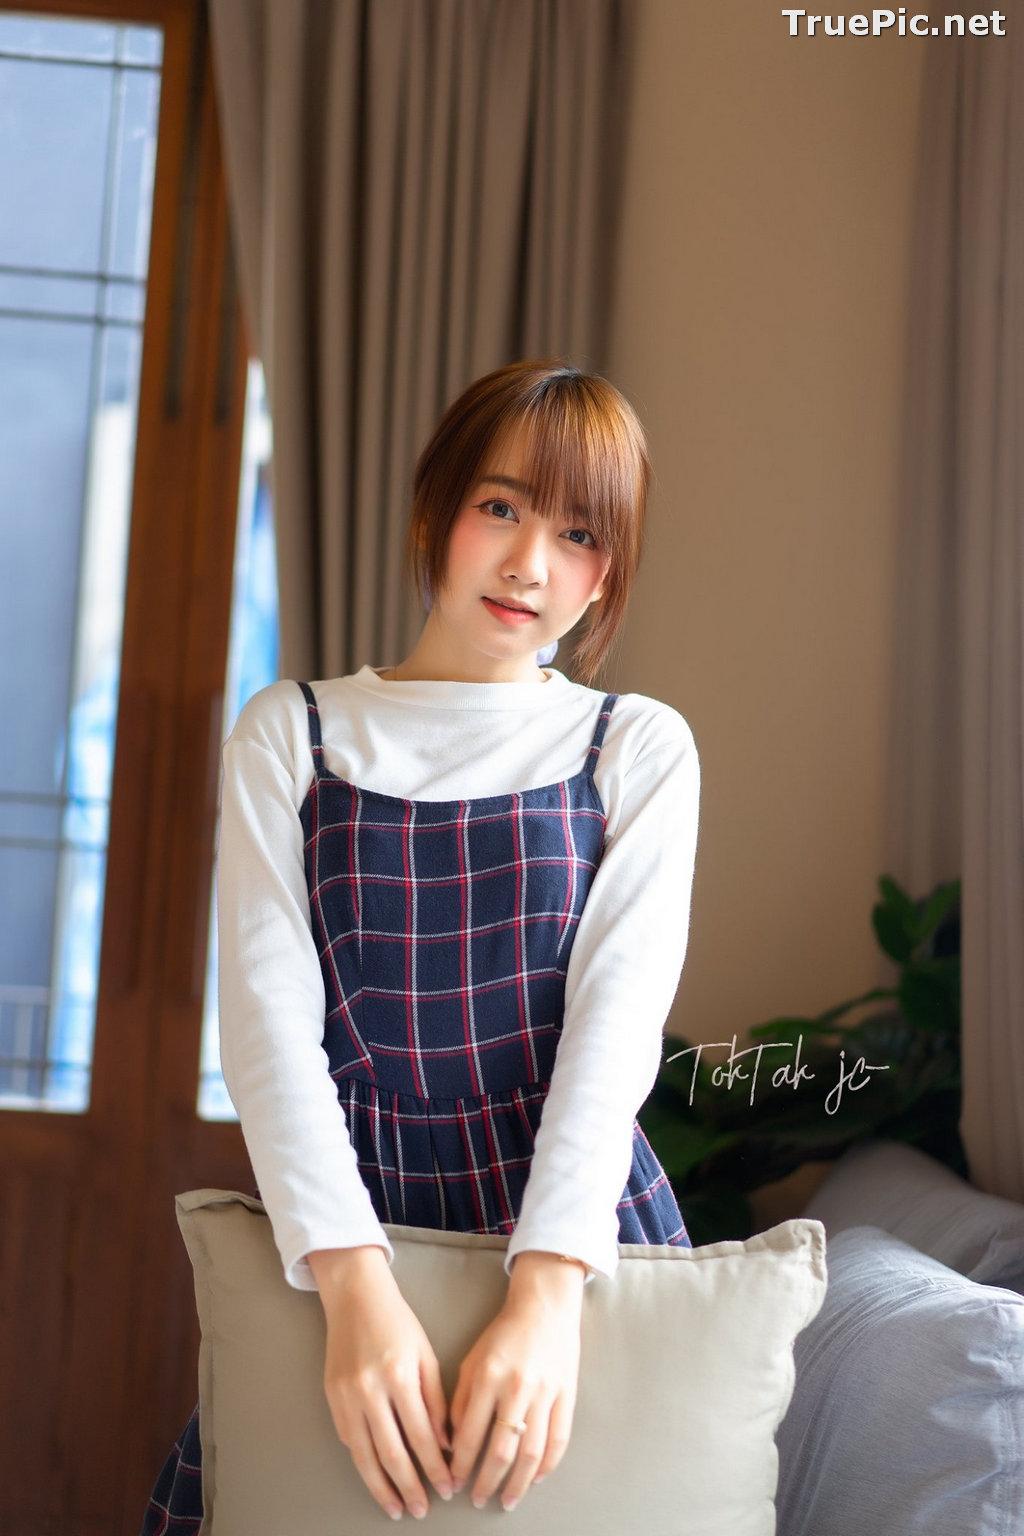 Image Thailand Model - Fenfern Aeryingsak - Cute School Girl - TruePic.net - Picture-8